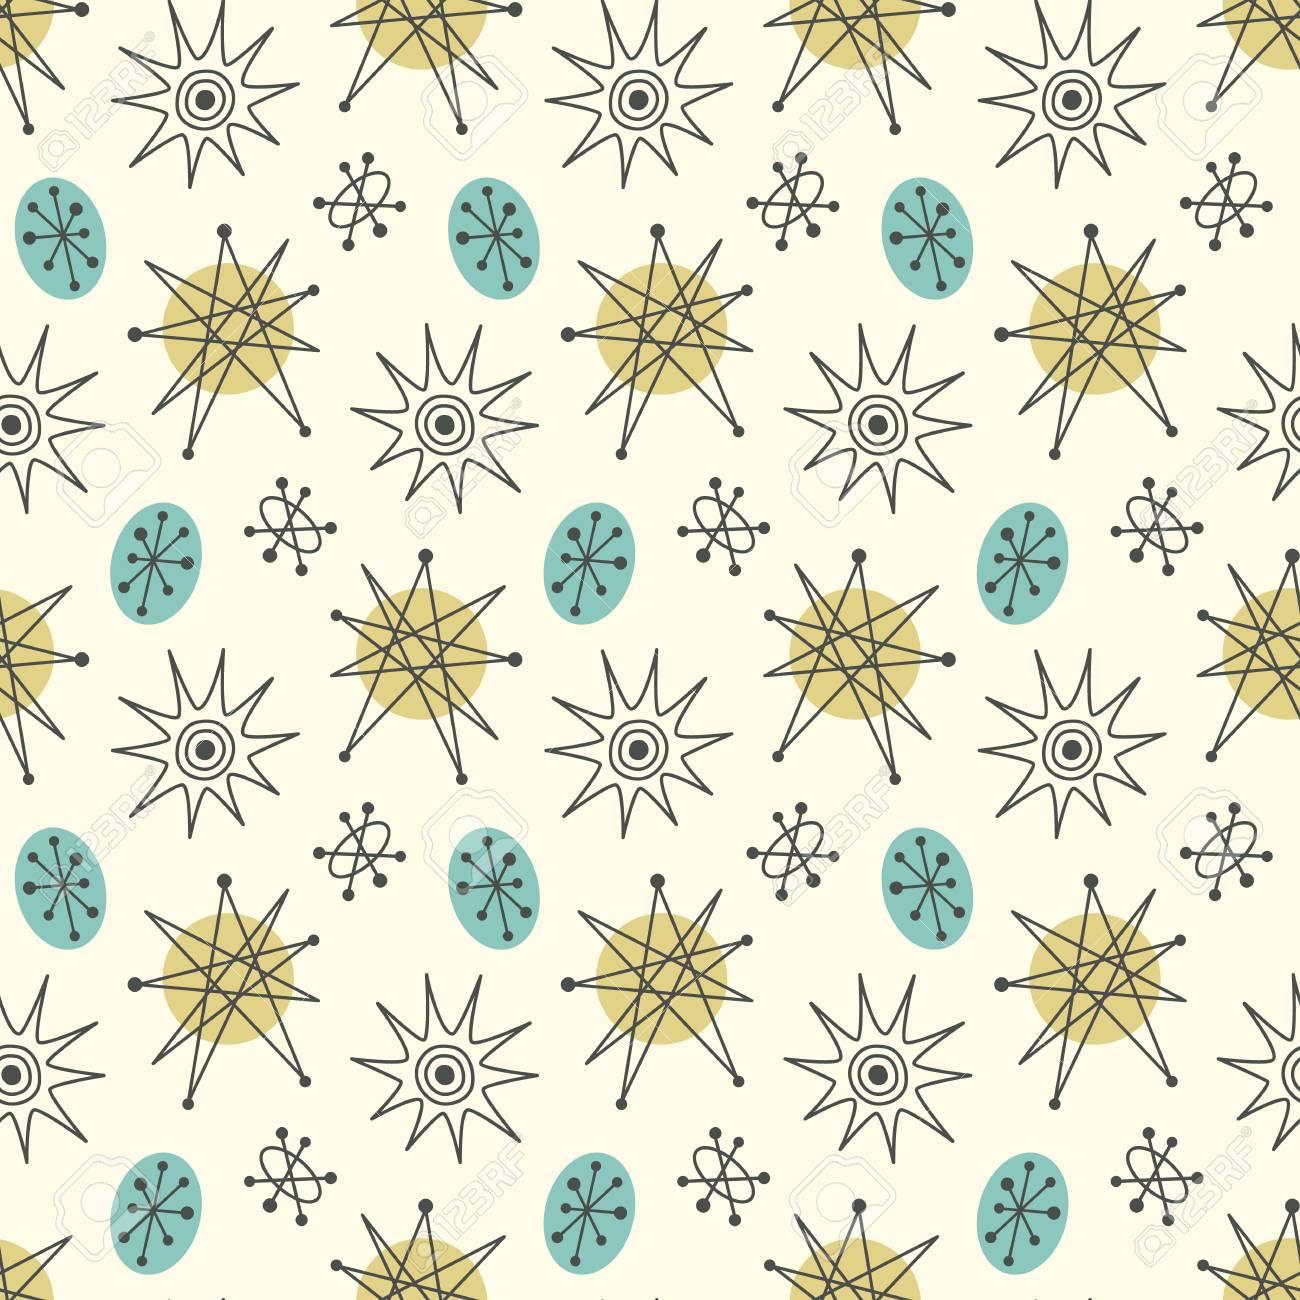 Mid century modern seamless pattern, stars in repetitive illustration. - 94982461